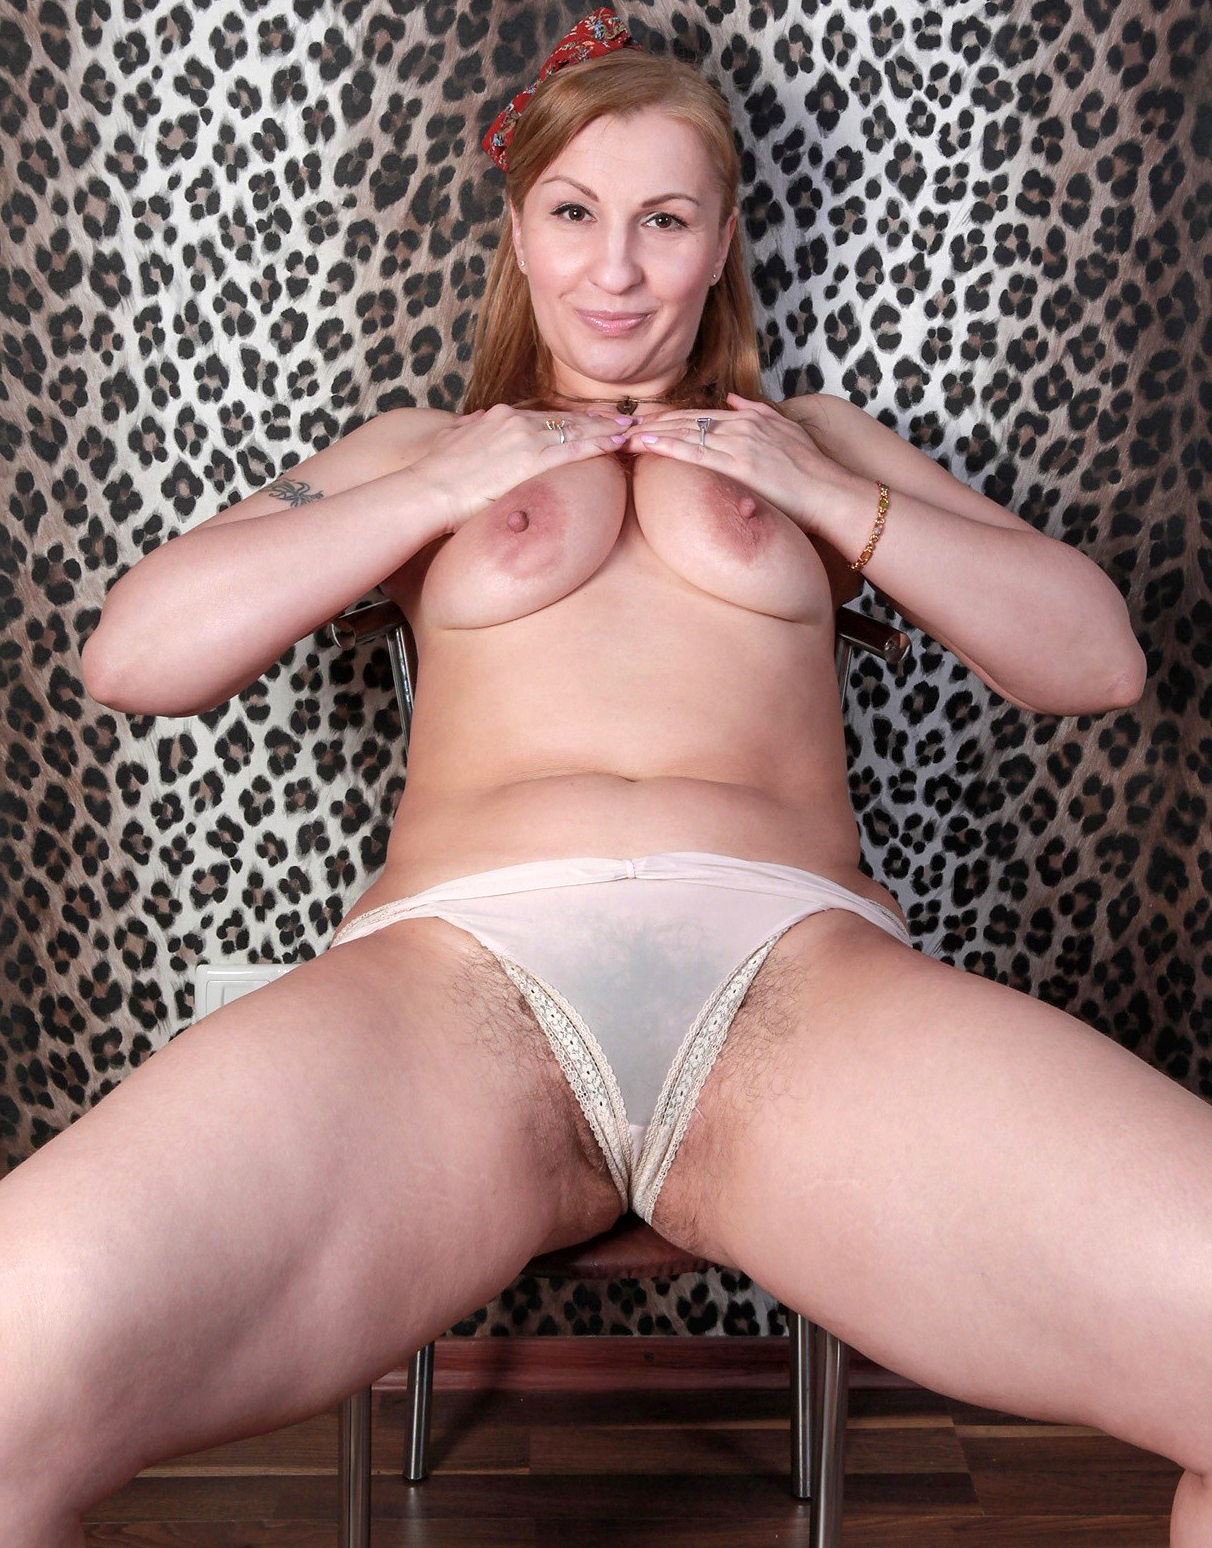 Live intense female orgasm